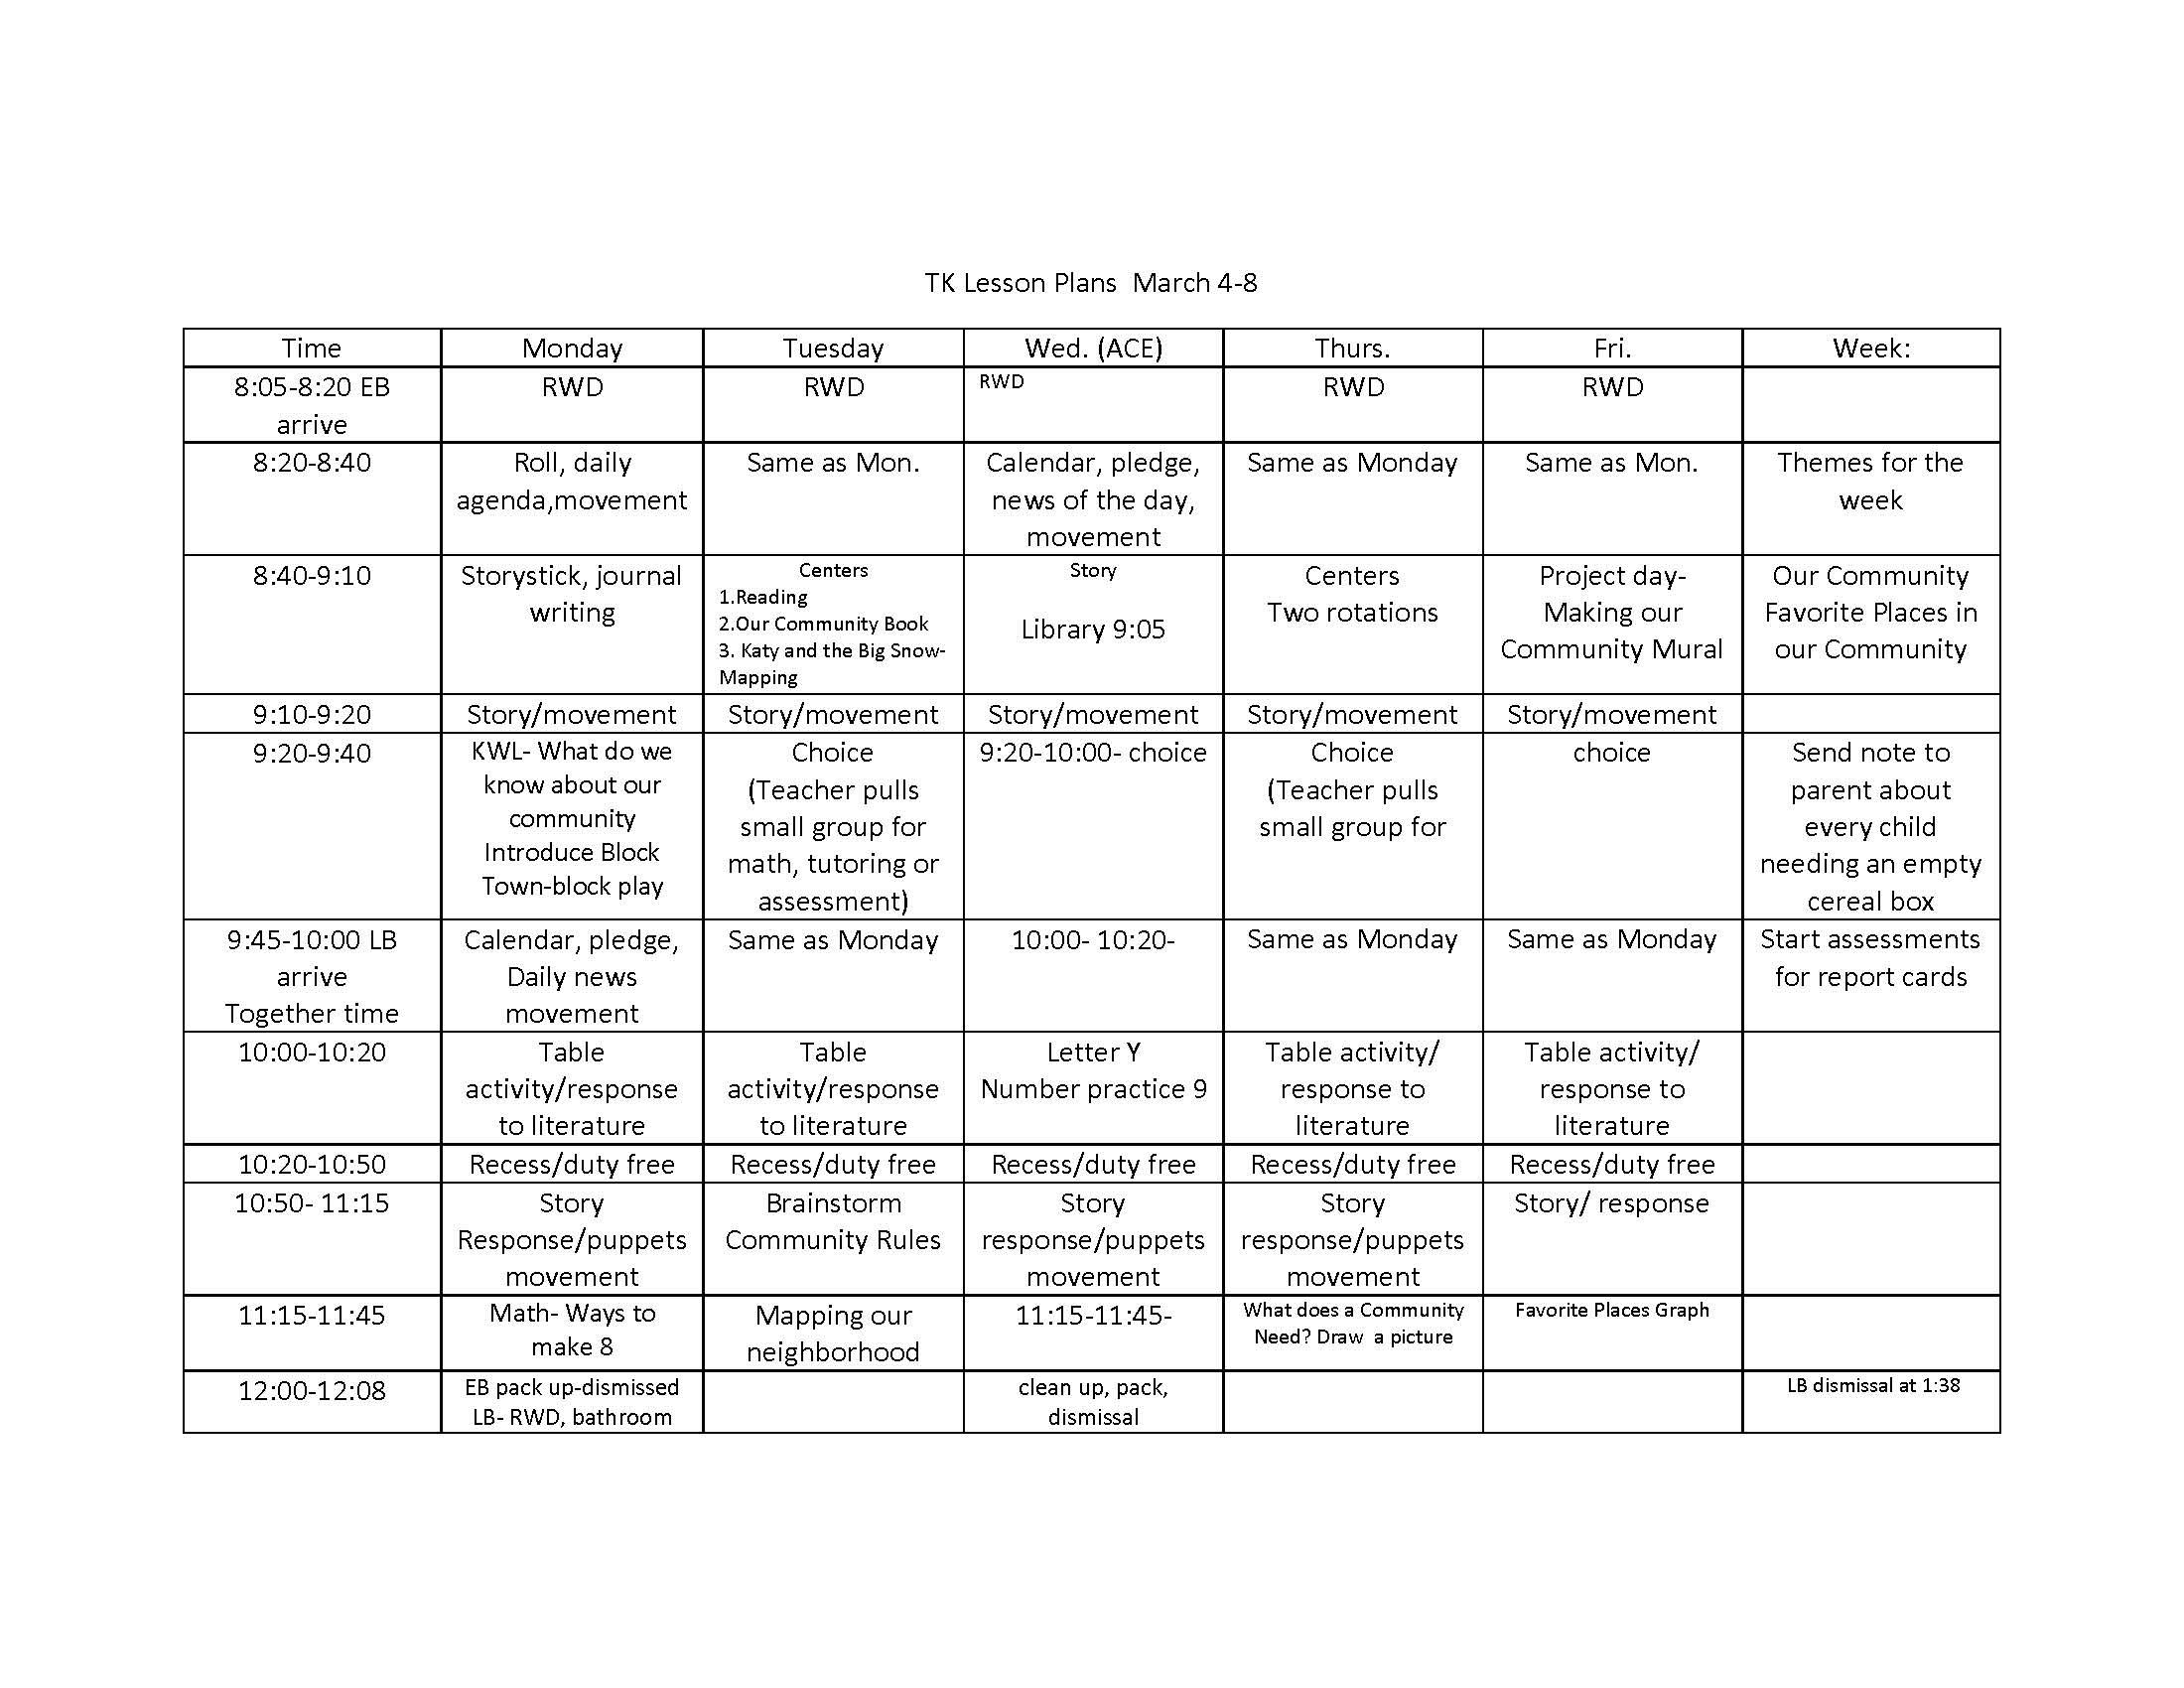 Transitional Kindergarten Schedule & Lesson Plans